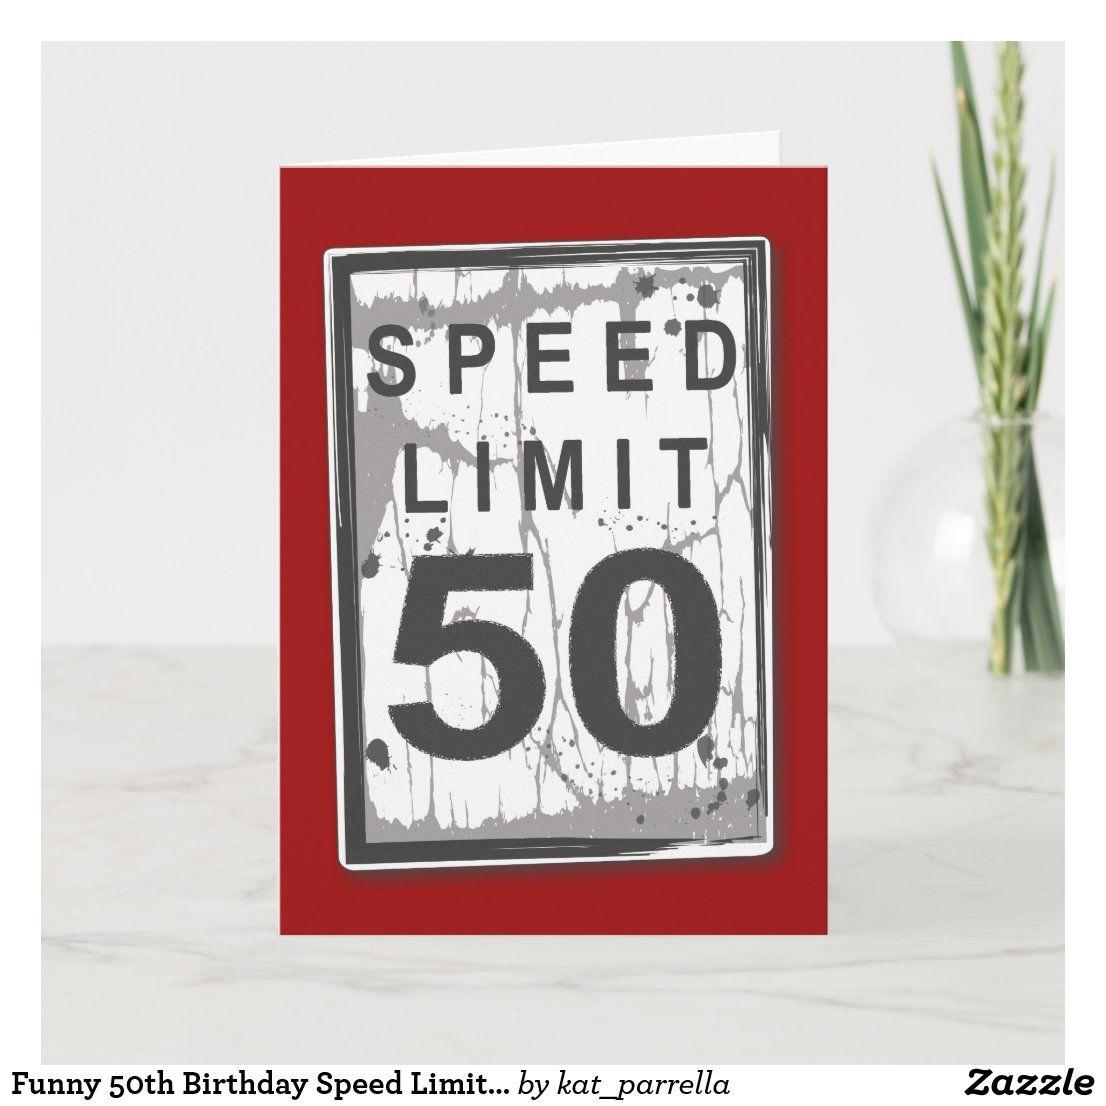 Funny 50th Birthday Speed Limit Card di 2020